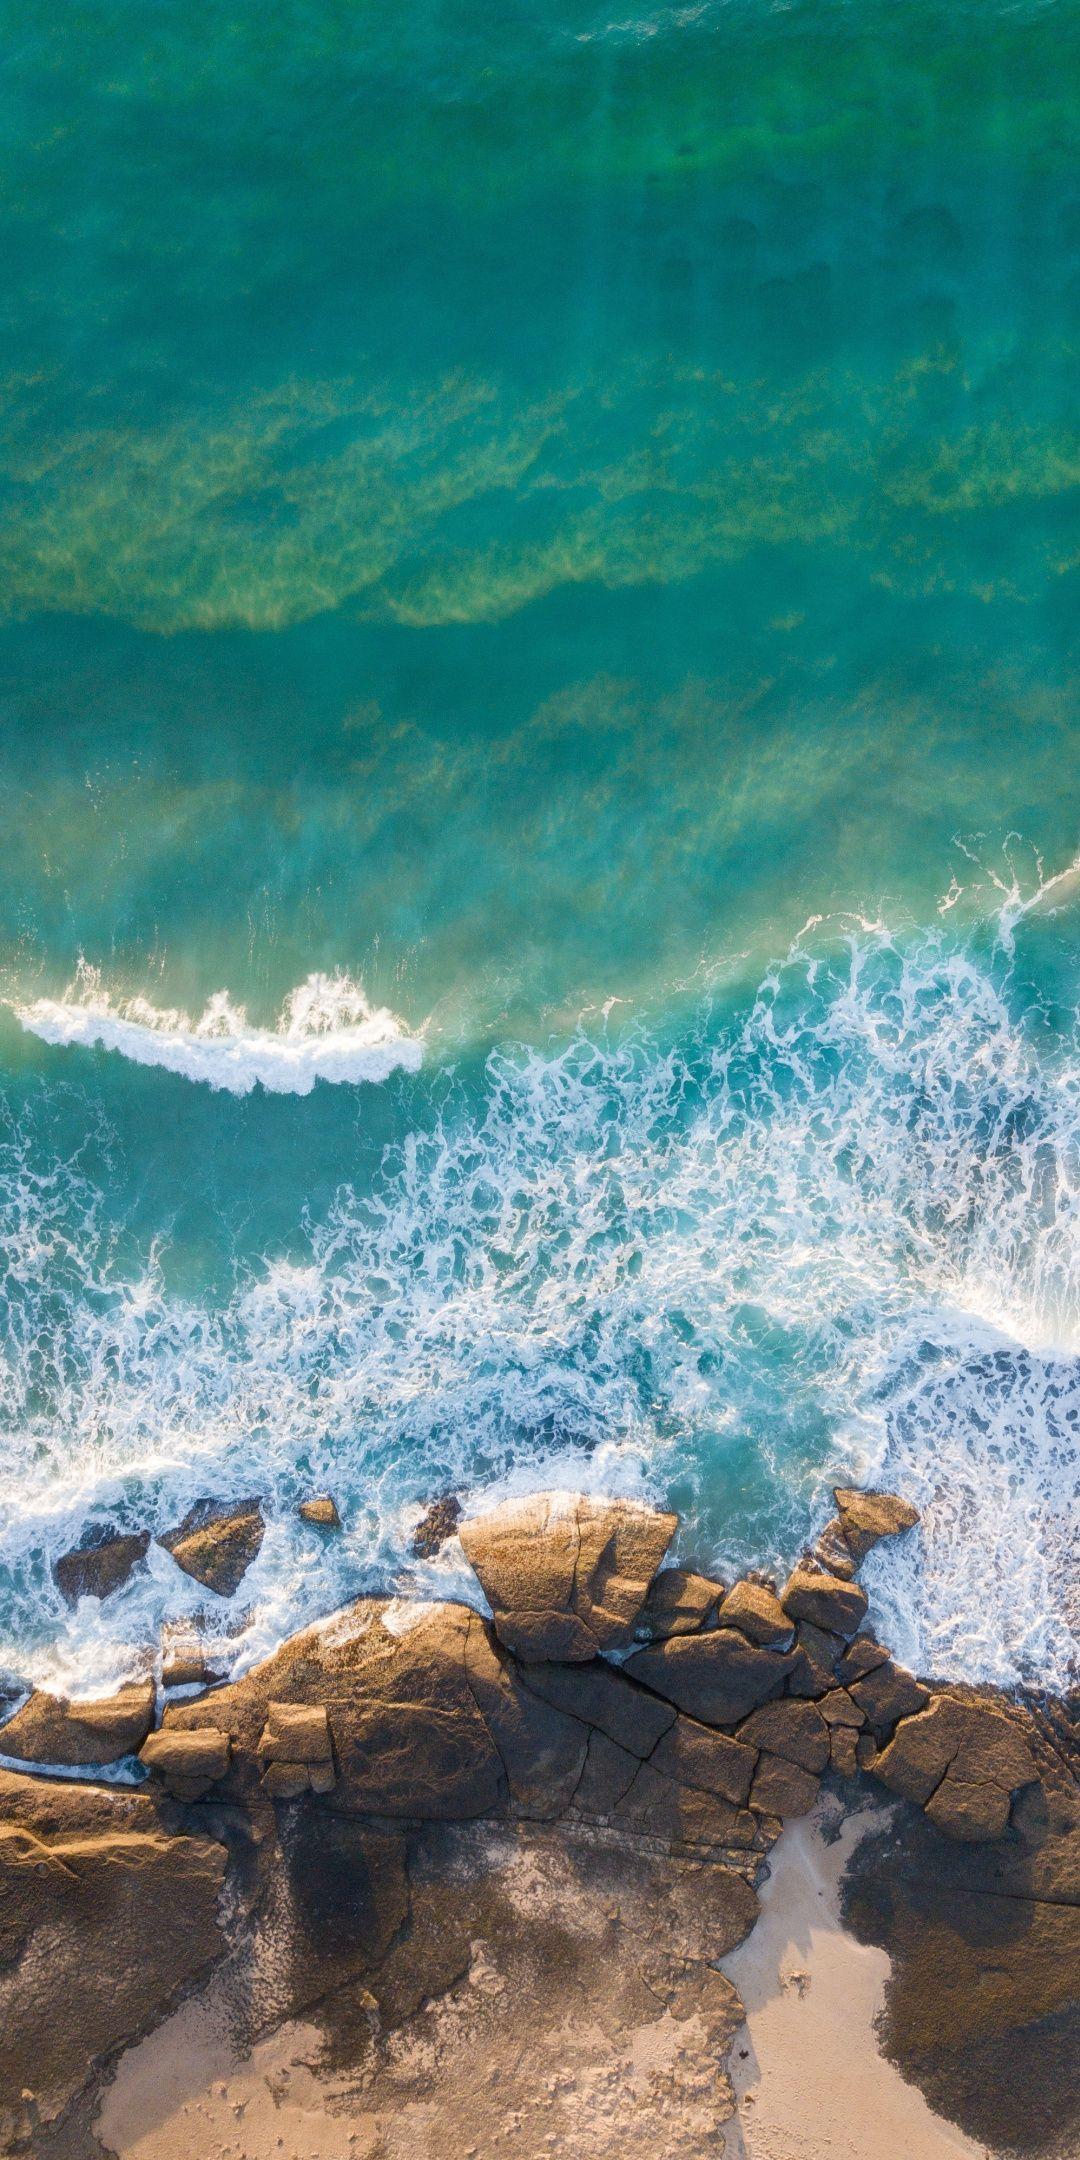 Coast Rocks Blue Green Sea Sea Waves Drone Shot Nature 1080x2160 Wallpaper Manzara Manzara Fotografciligi Peyzaj Duzenlemesi Fikirleri Wallpaper beach sea waves rocks coast